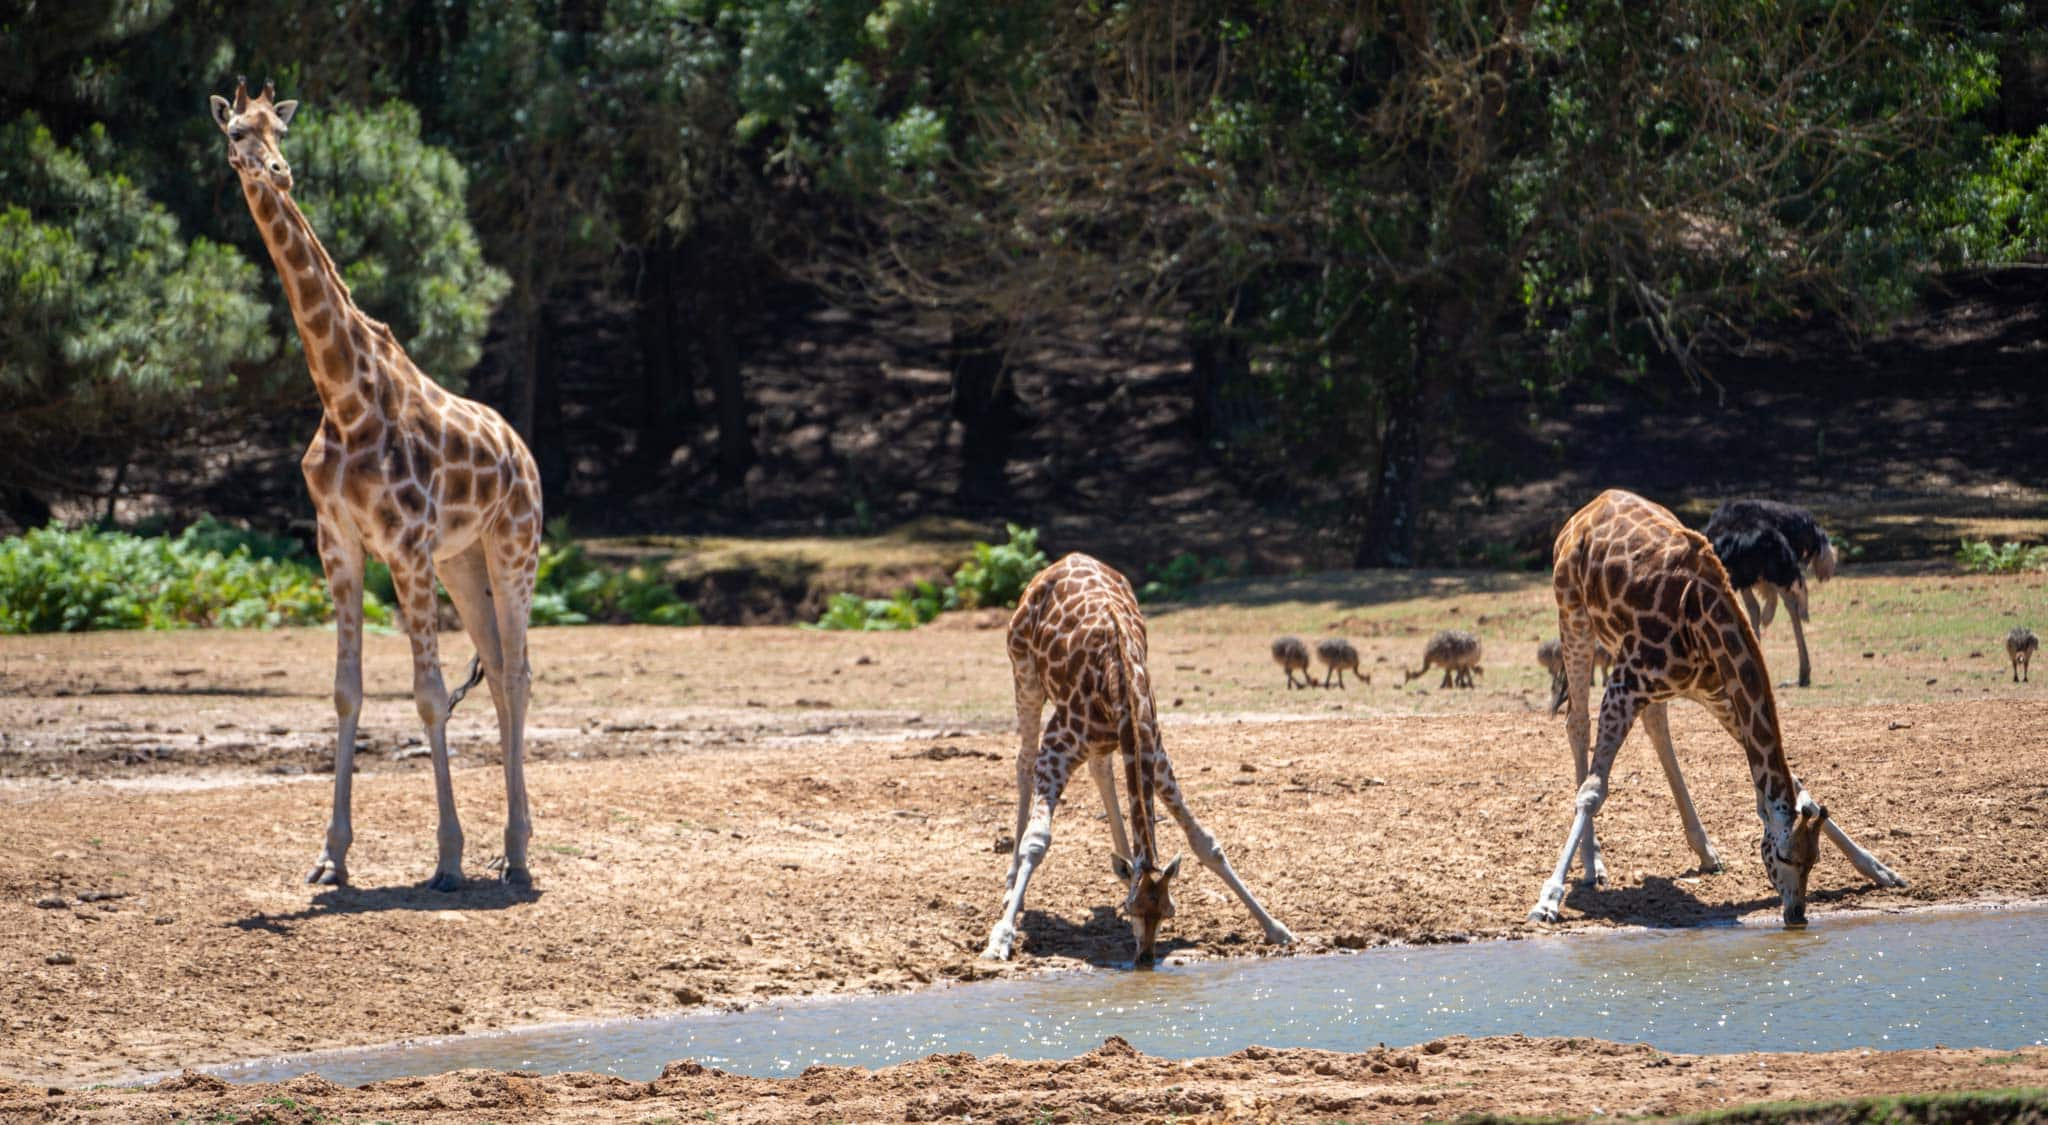 Bodeca safari park provides an alternative to the beaches